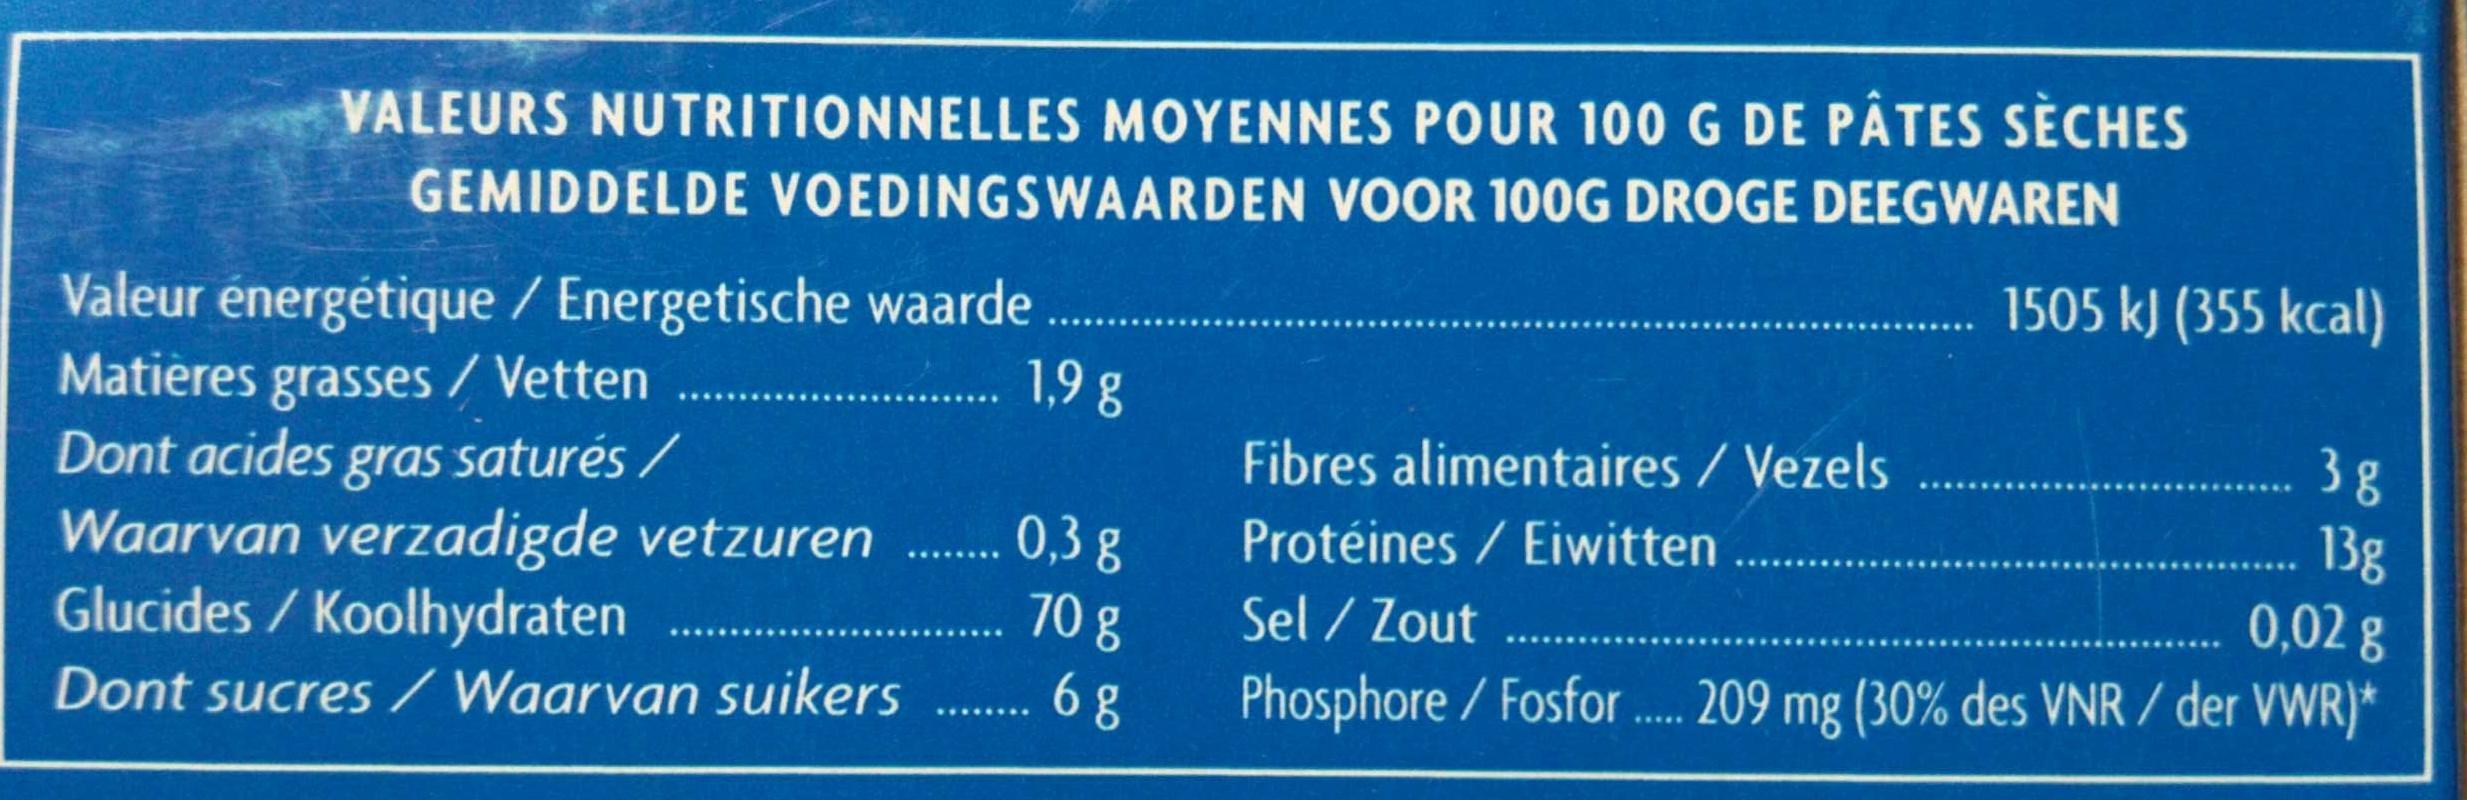 Coquillettes - Pâtes alimentaires - Informations nutritionnelles - fr